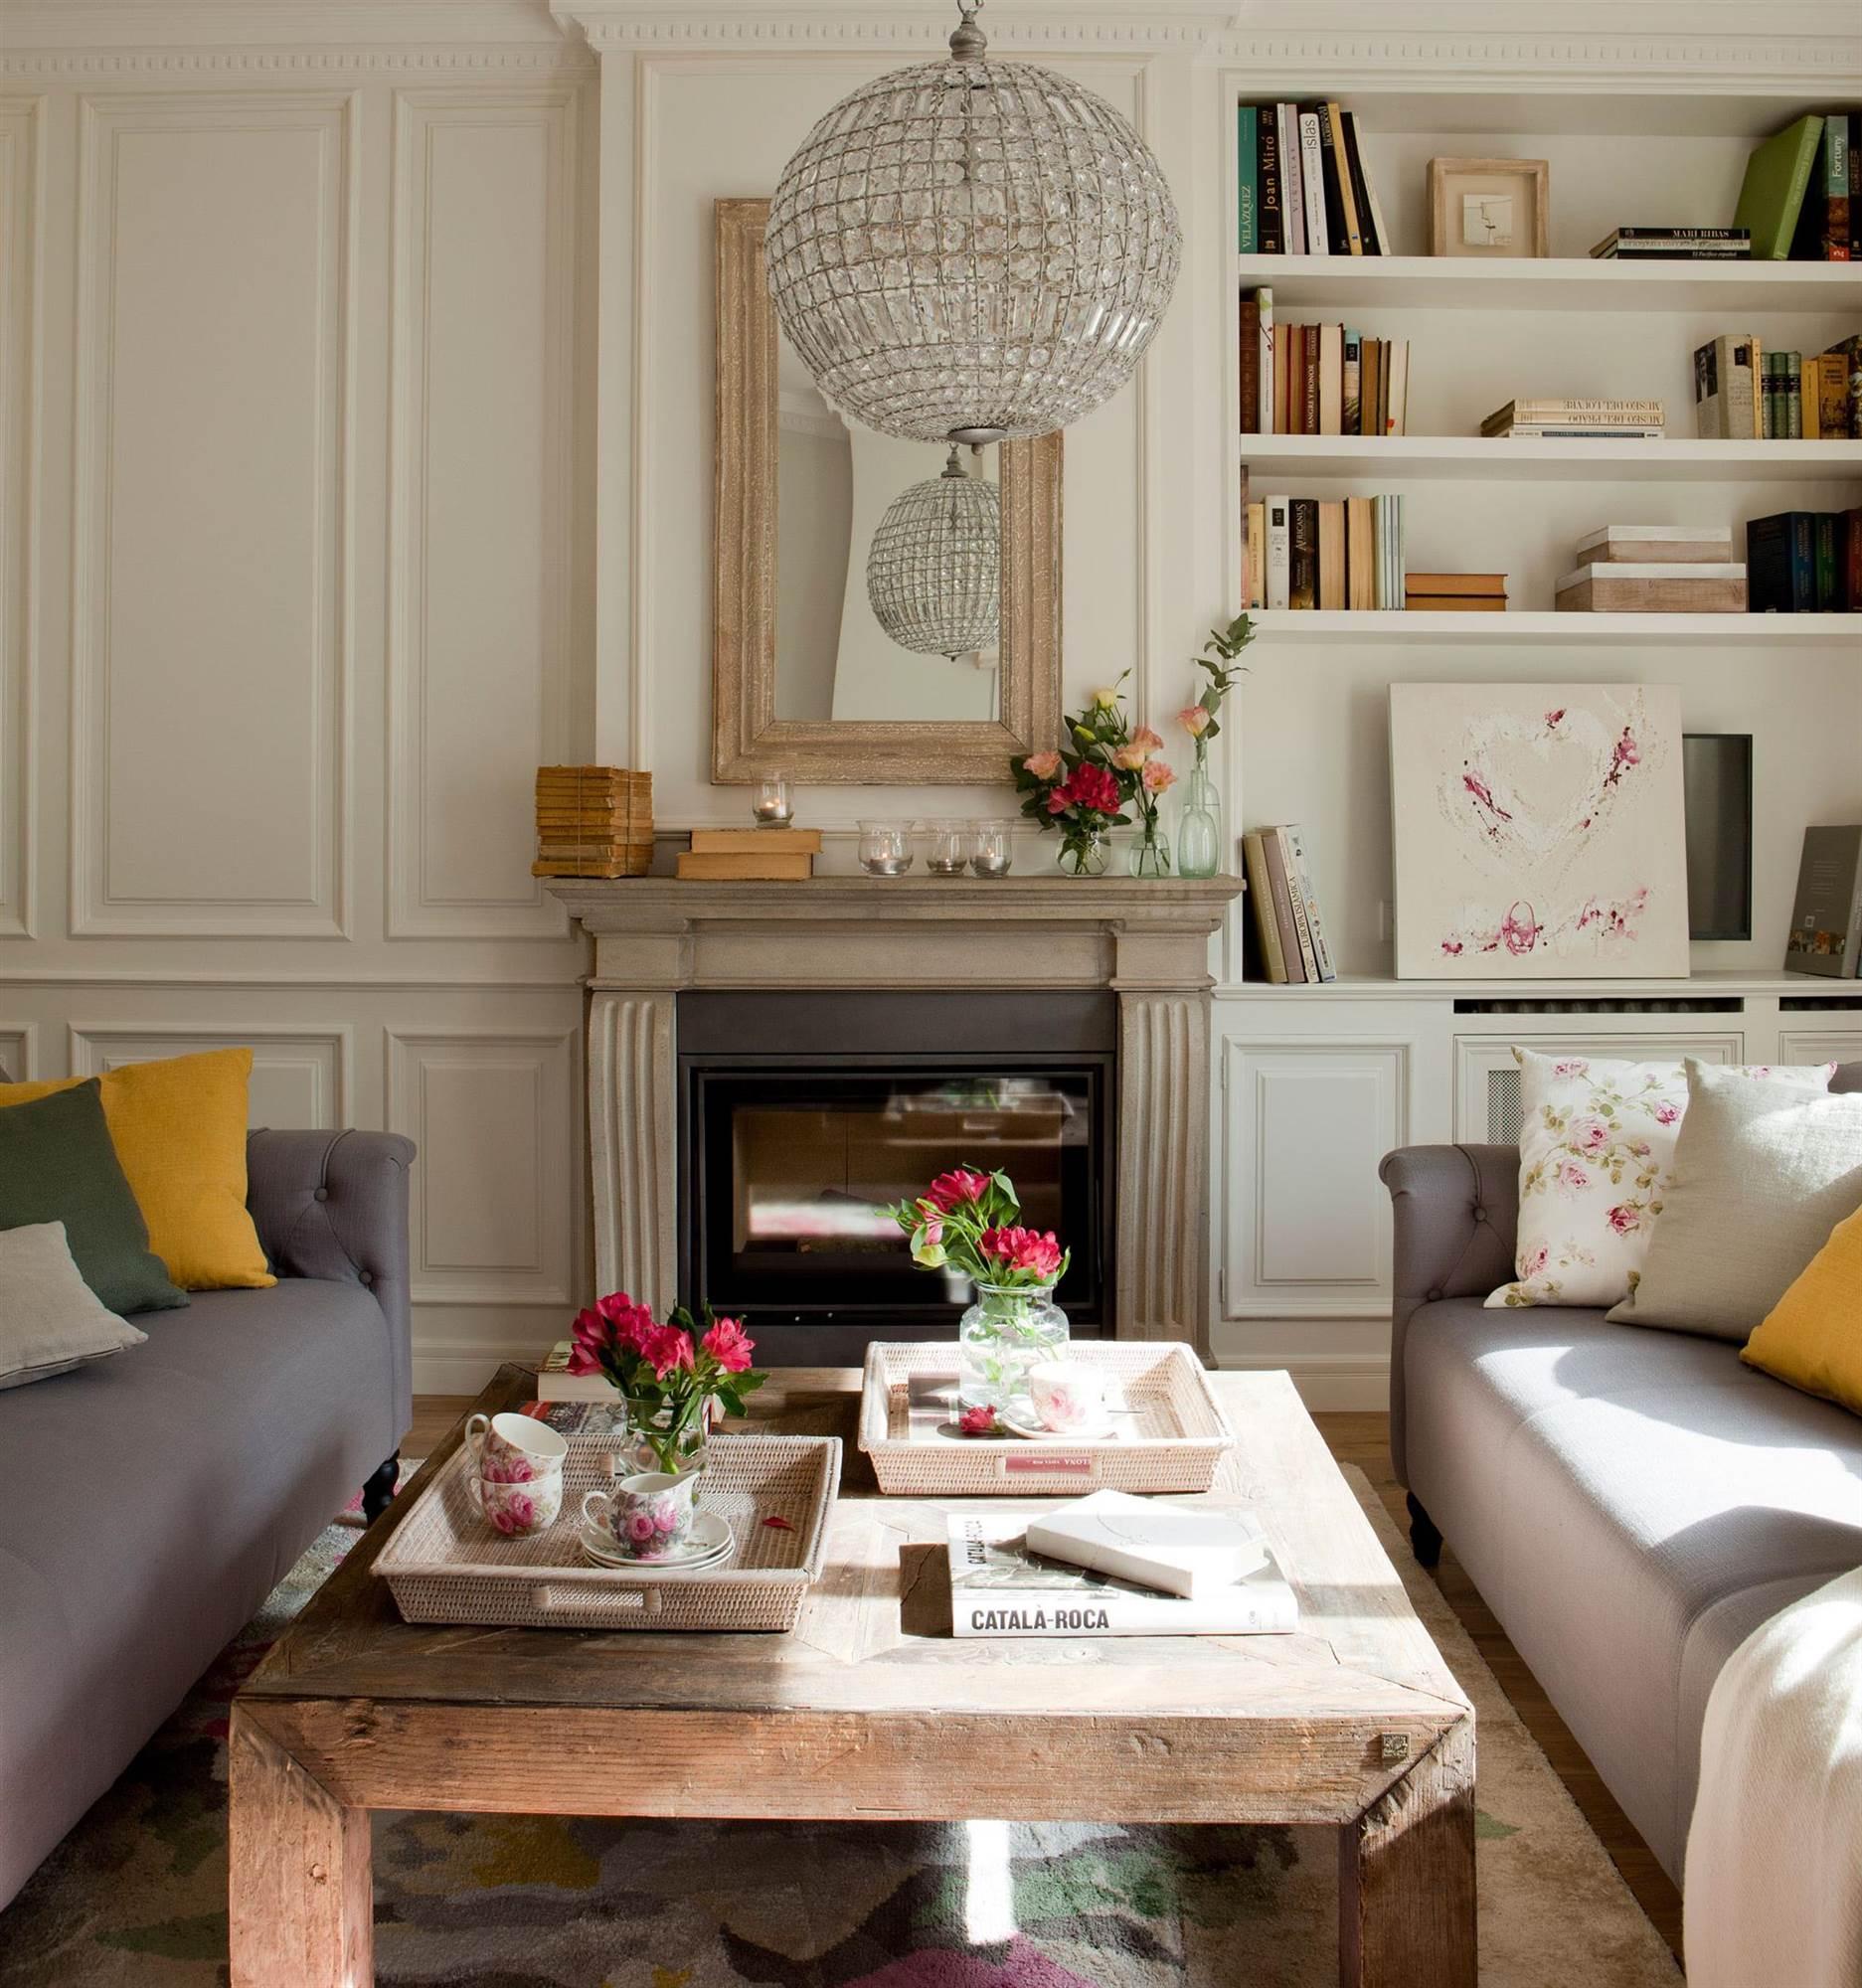 Ventajas de tener una chimenea en casa - Chimenea de pared ...